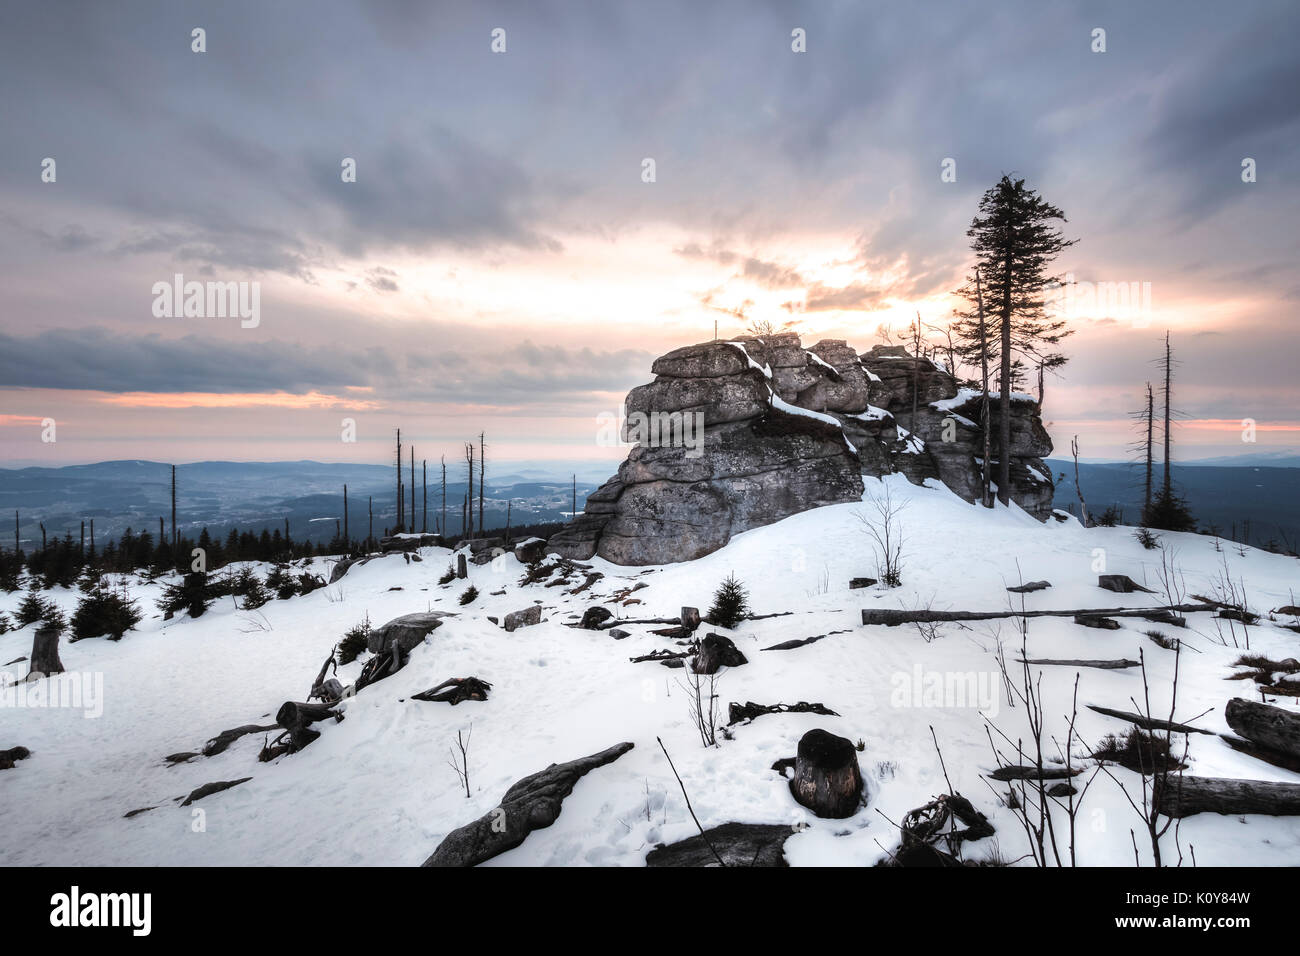 Winter landscape at Dreisessel, Haidmühle, Bavarian Forest, Niederbayern, Bavaria, Germany - Stock Image